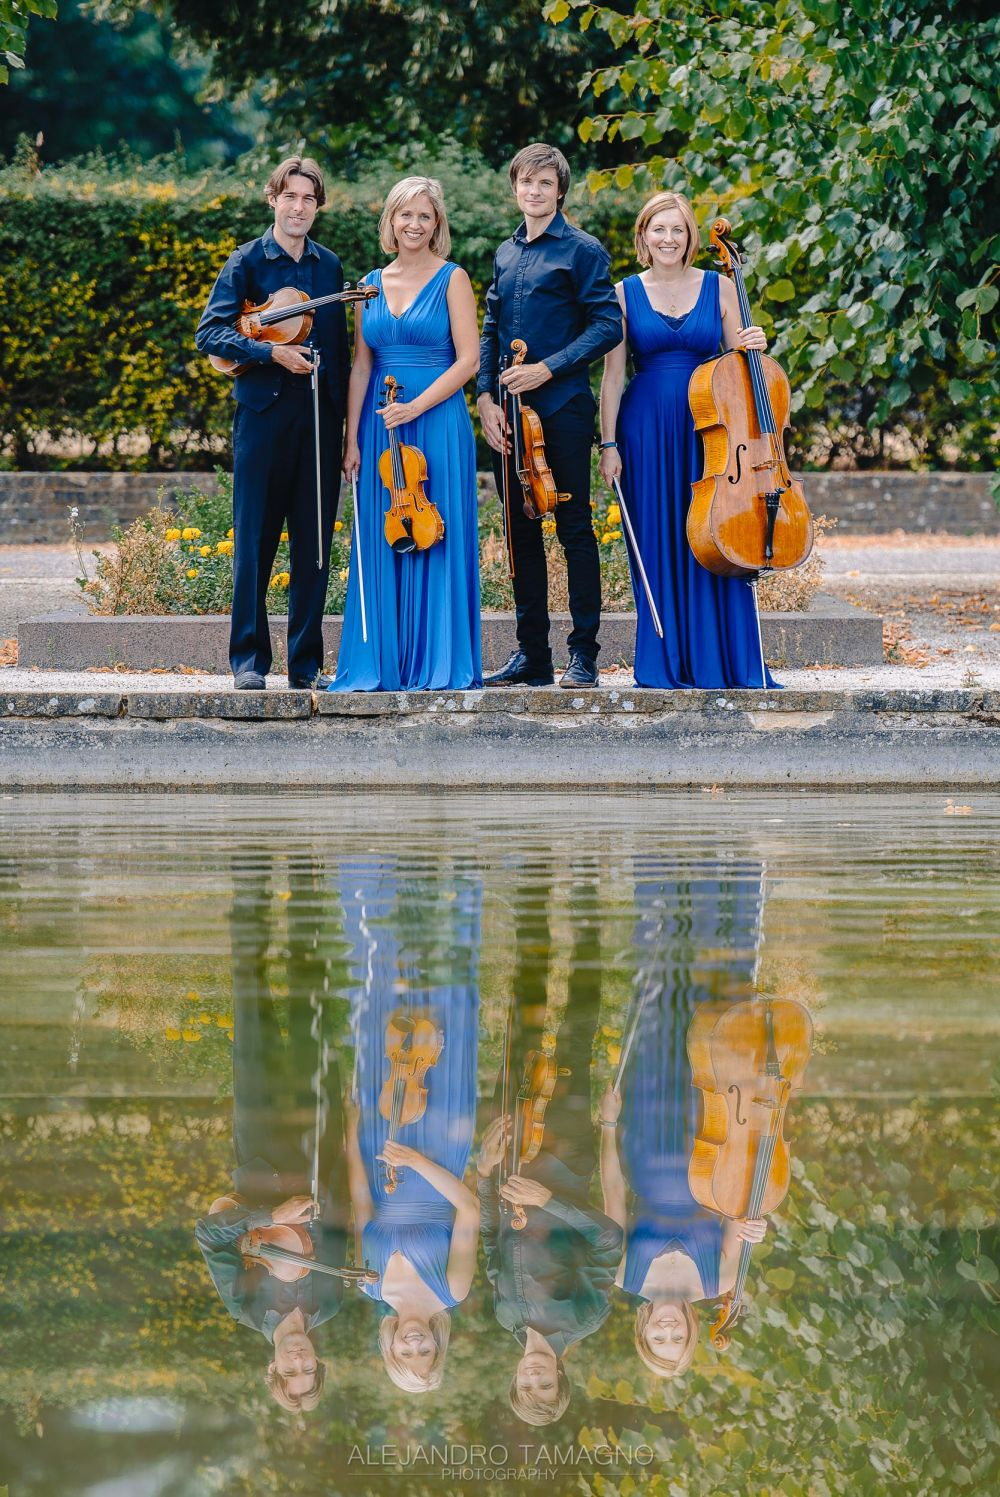 Sacconi Quartet banner image